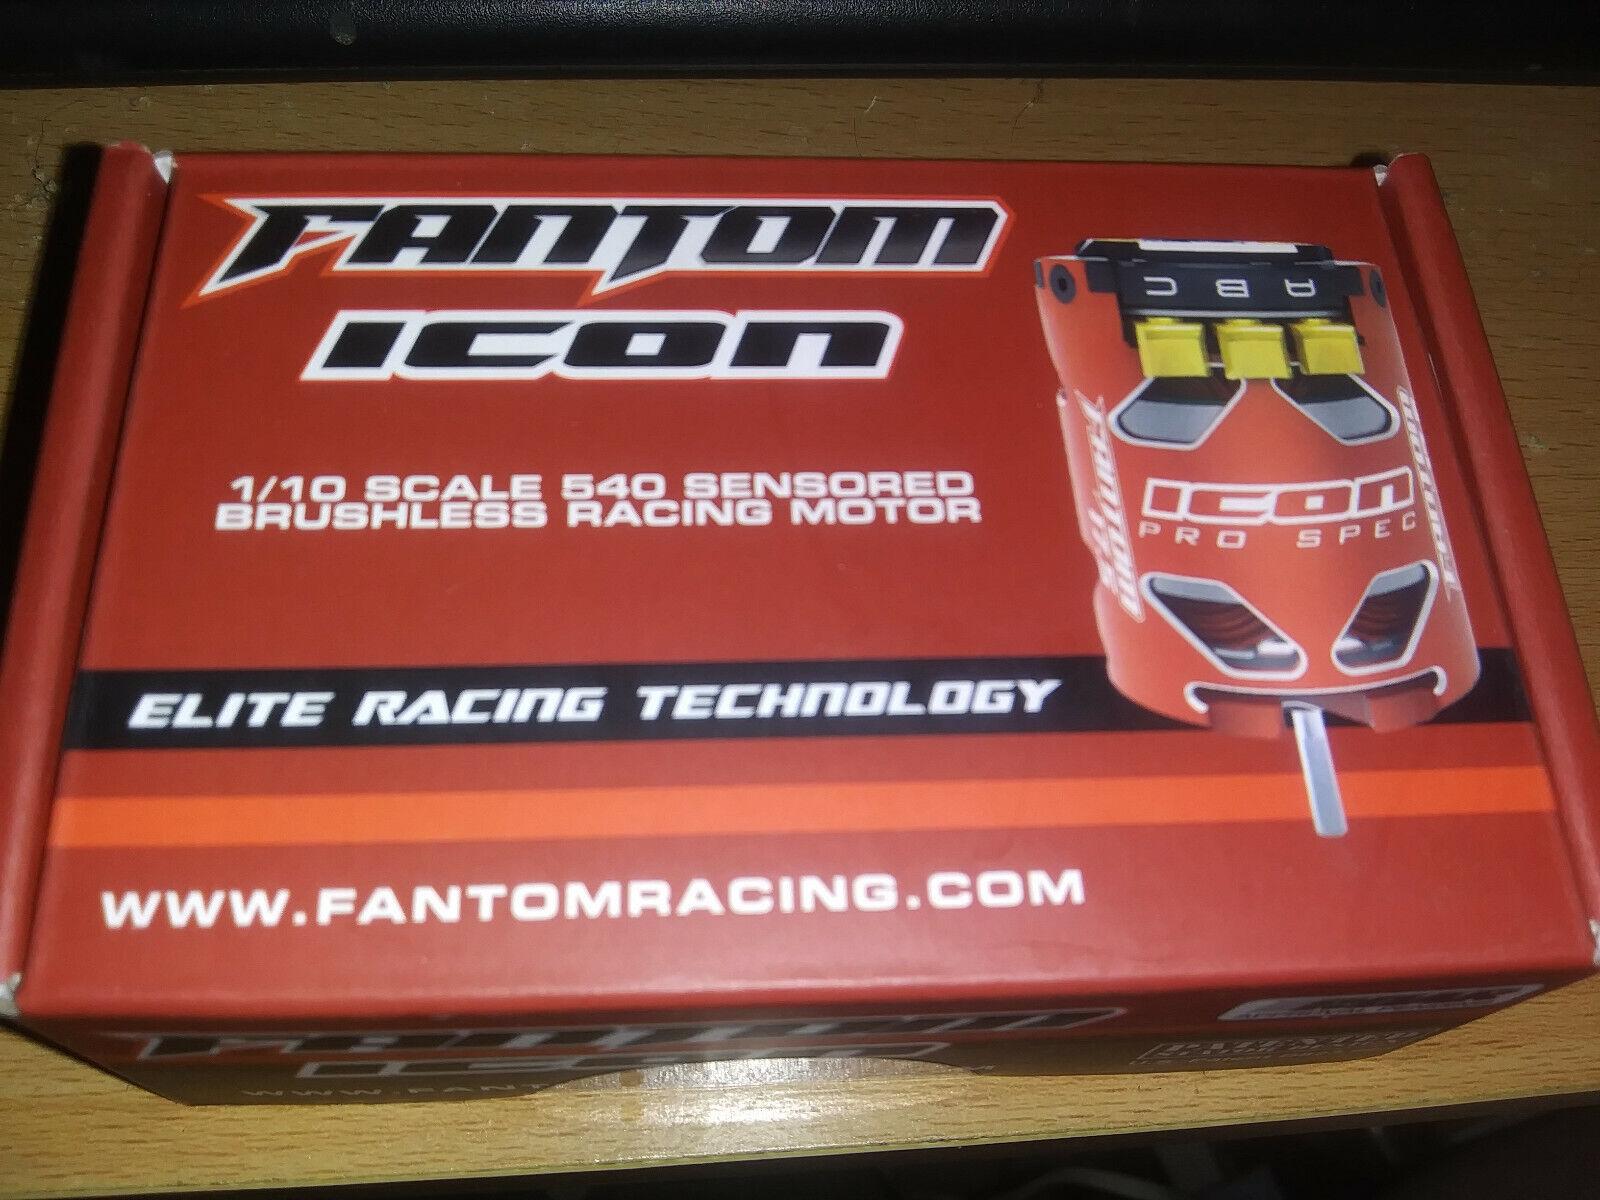 FAN19339  ICON 6.5 Turn 9.5T  Pro Modified Brushless Motor nuovo In scatola  vendite calde